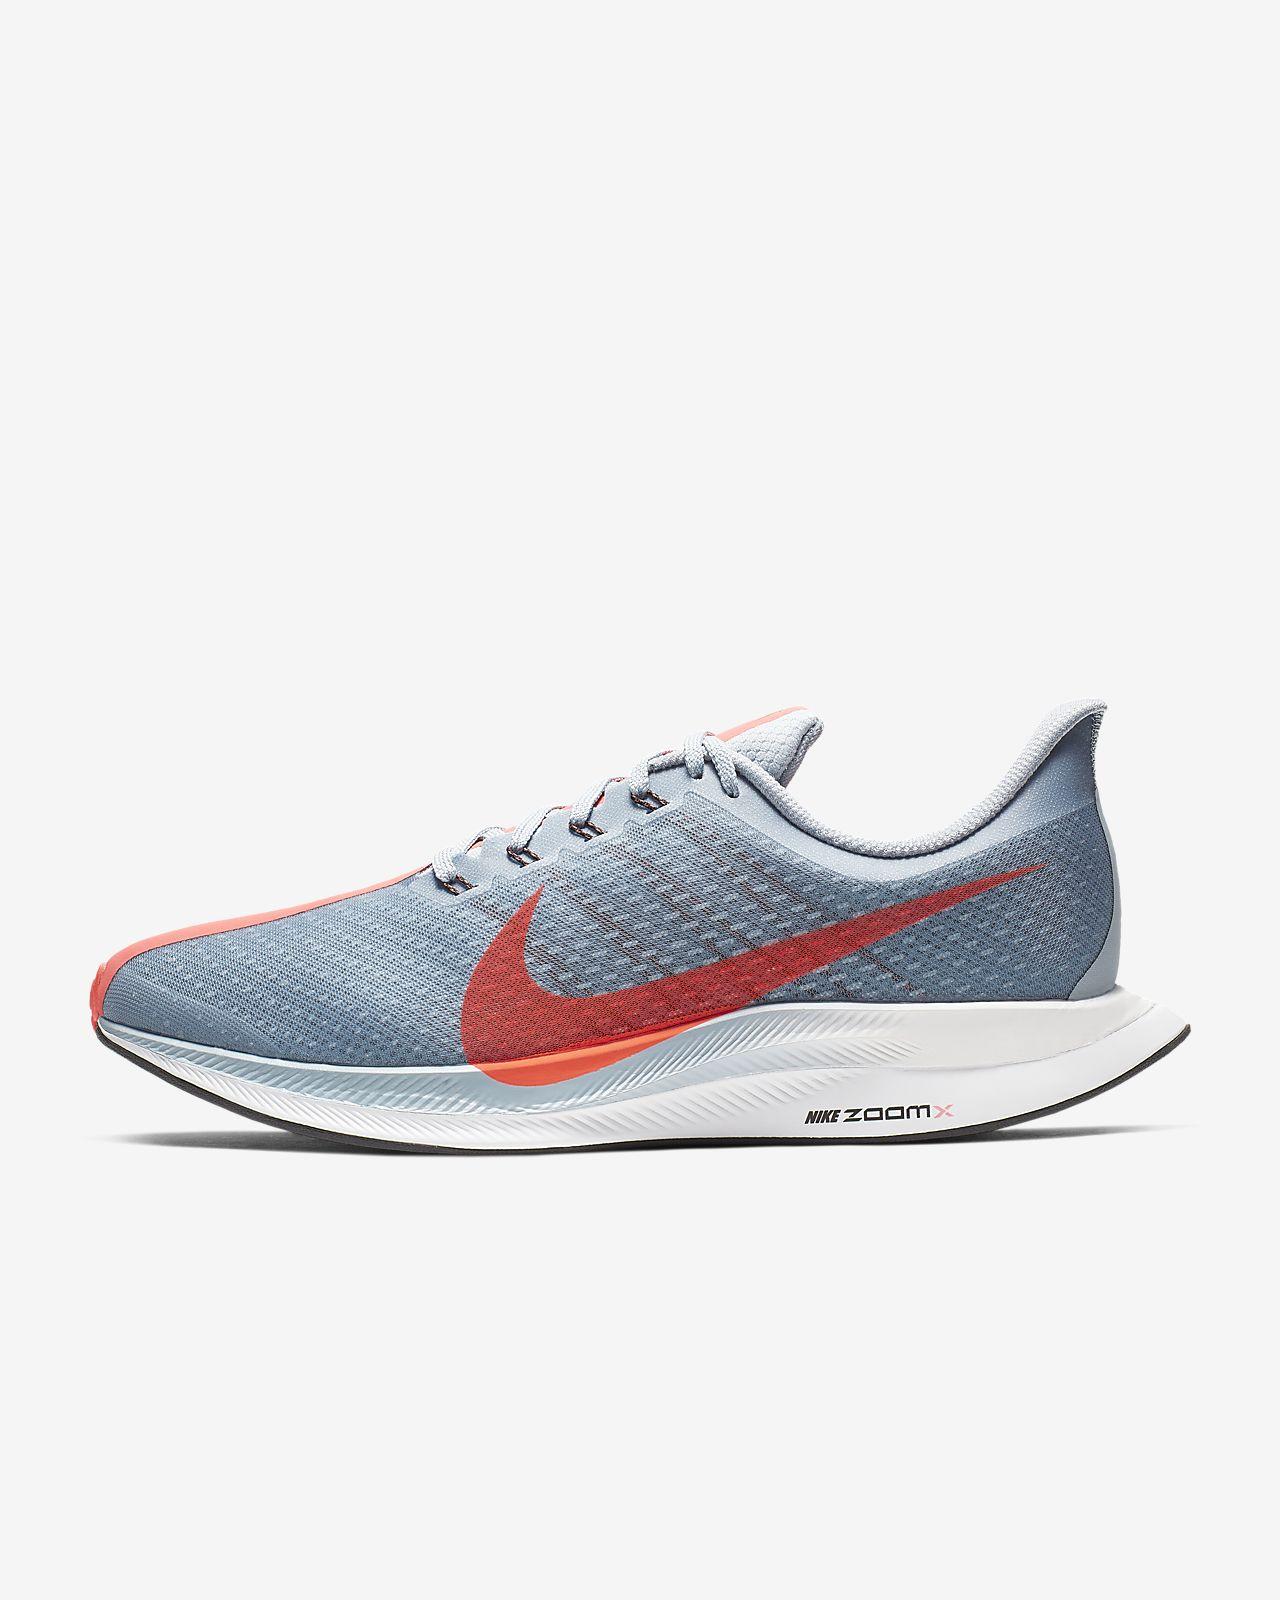 san francisco 3d793 f311c ... Löparsko Nike Zoom Pegasus Turbo för män